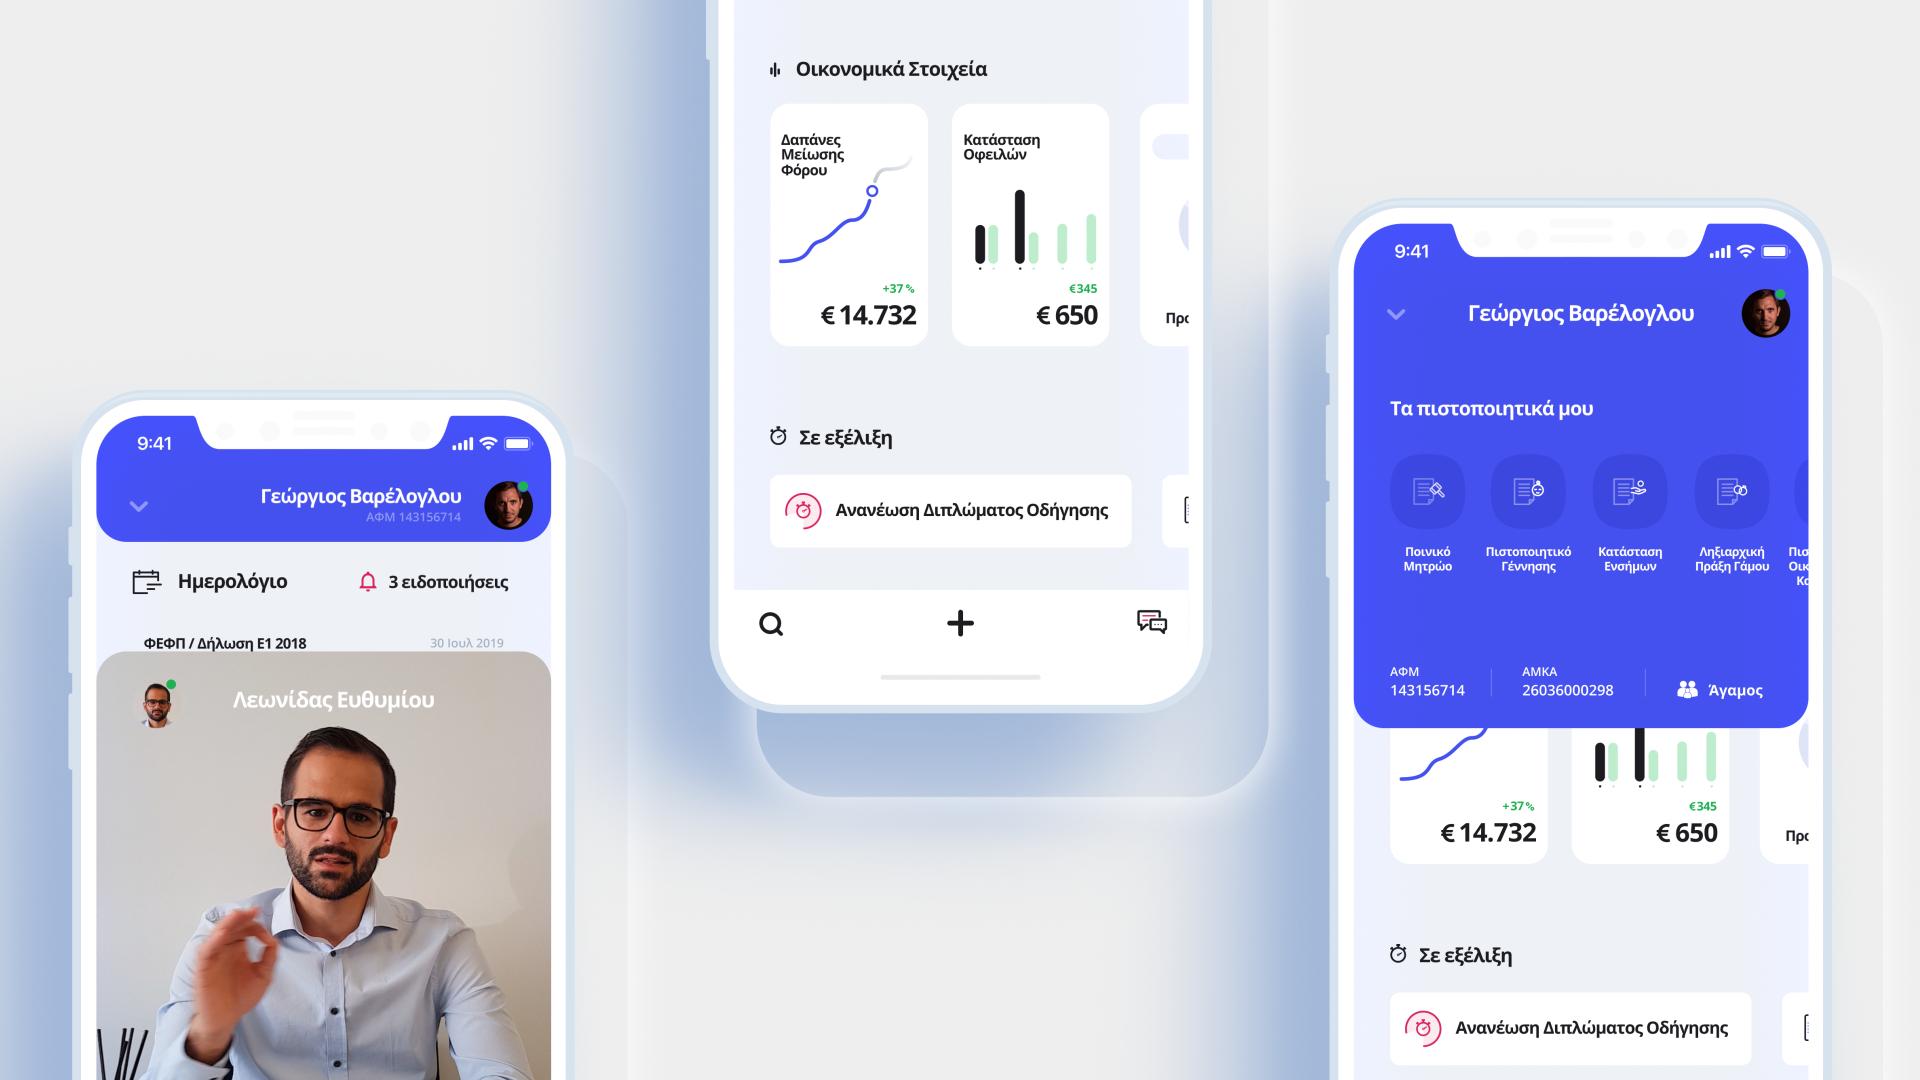 Country OS: Η εφαρμογή που έρχεται να κάνει πιο φιλικές τις συναλλαγές σου με το κράτος